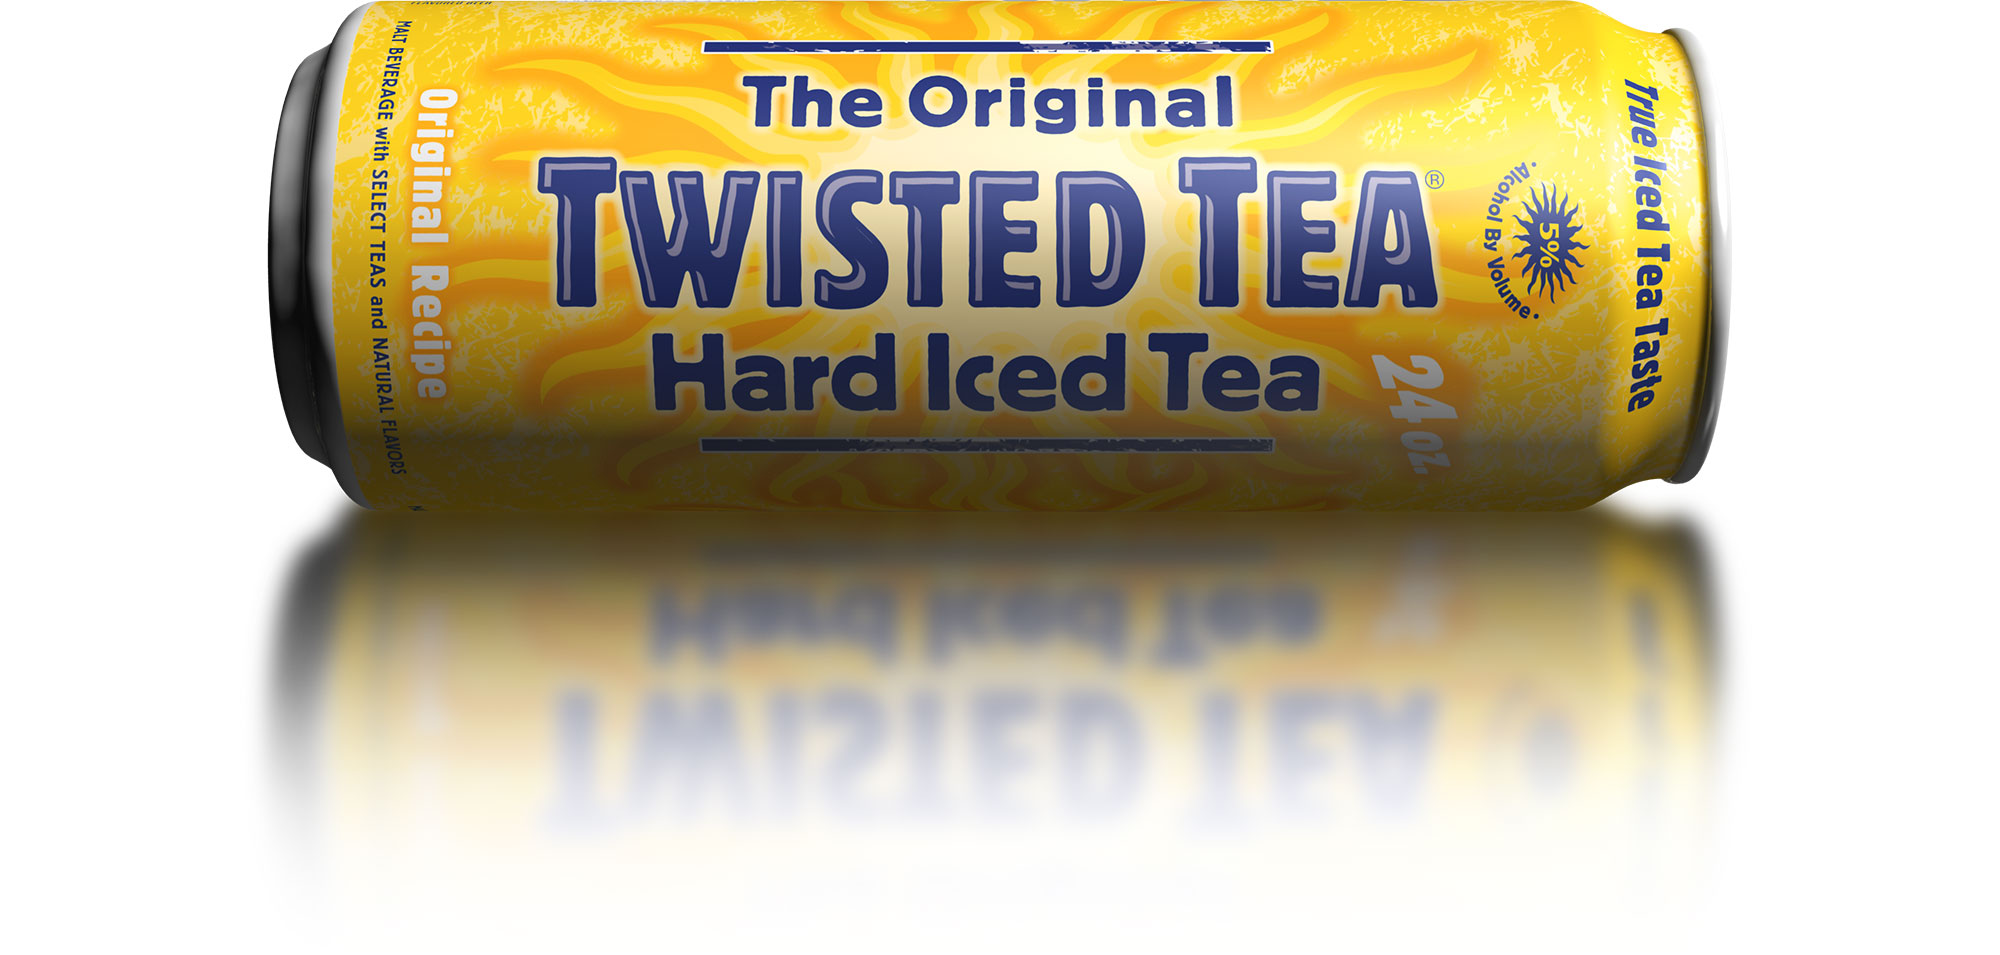 TwistedTea_can2.jpg